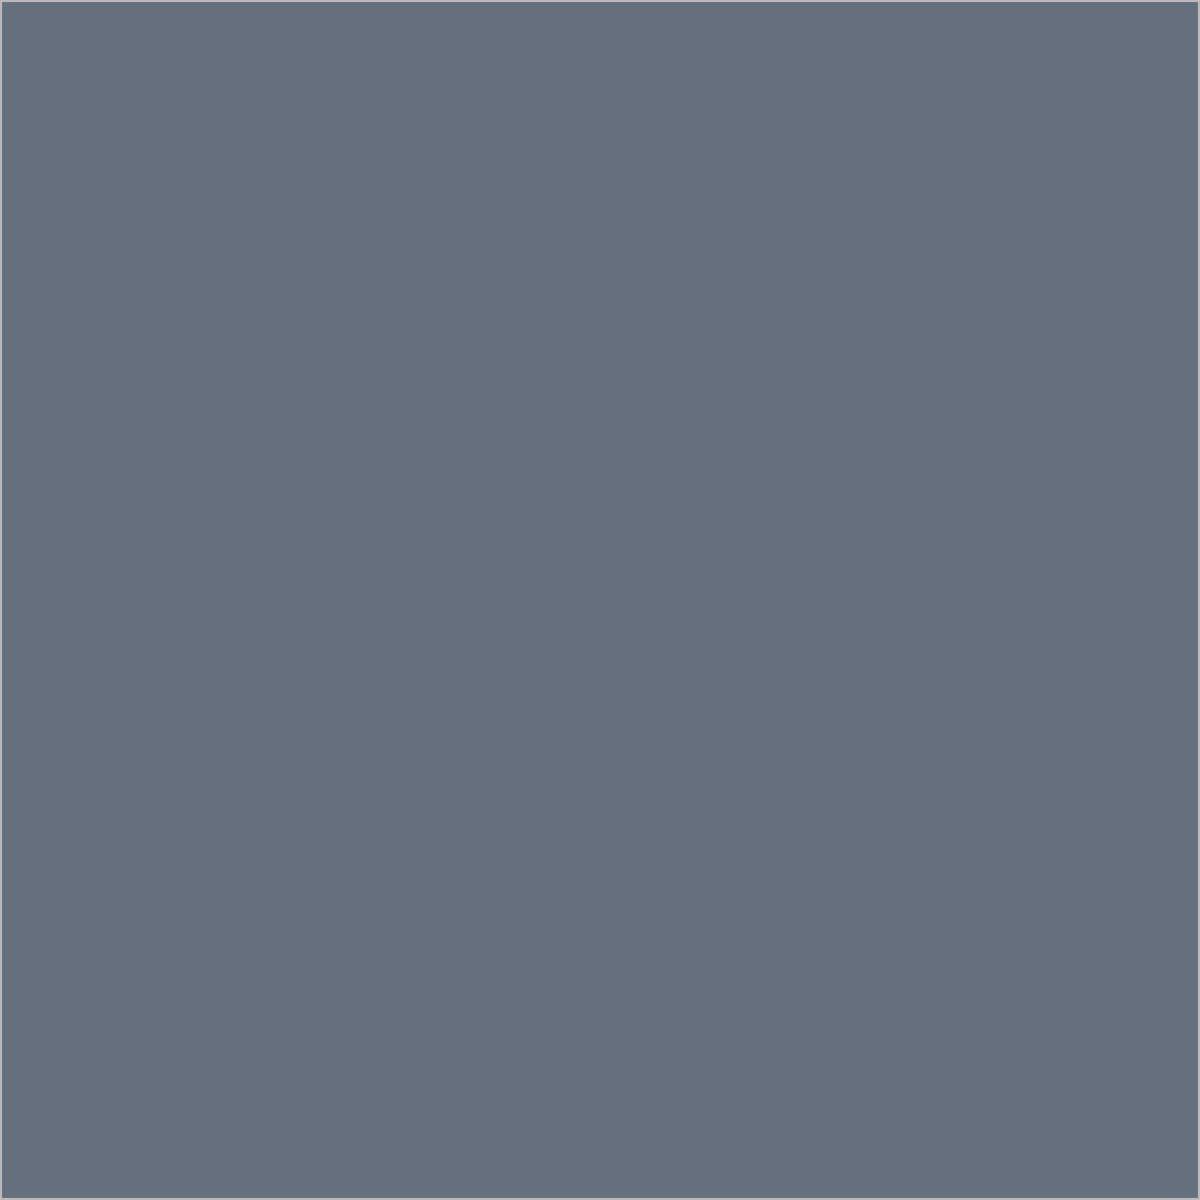 Painting the Past krijtverf, kleur SC83 Denim, Matt Emulsions 2,5 lit